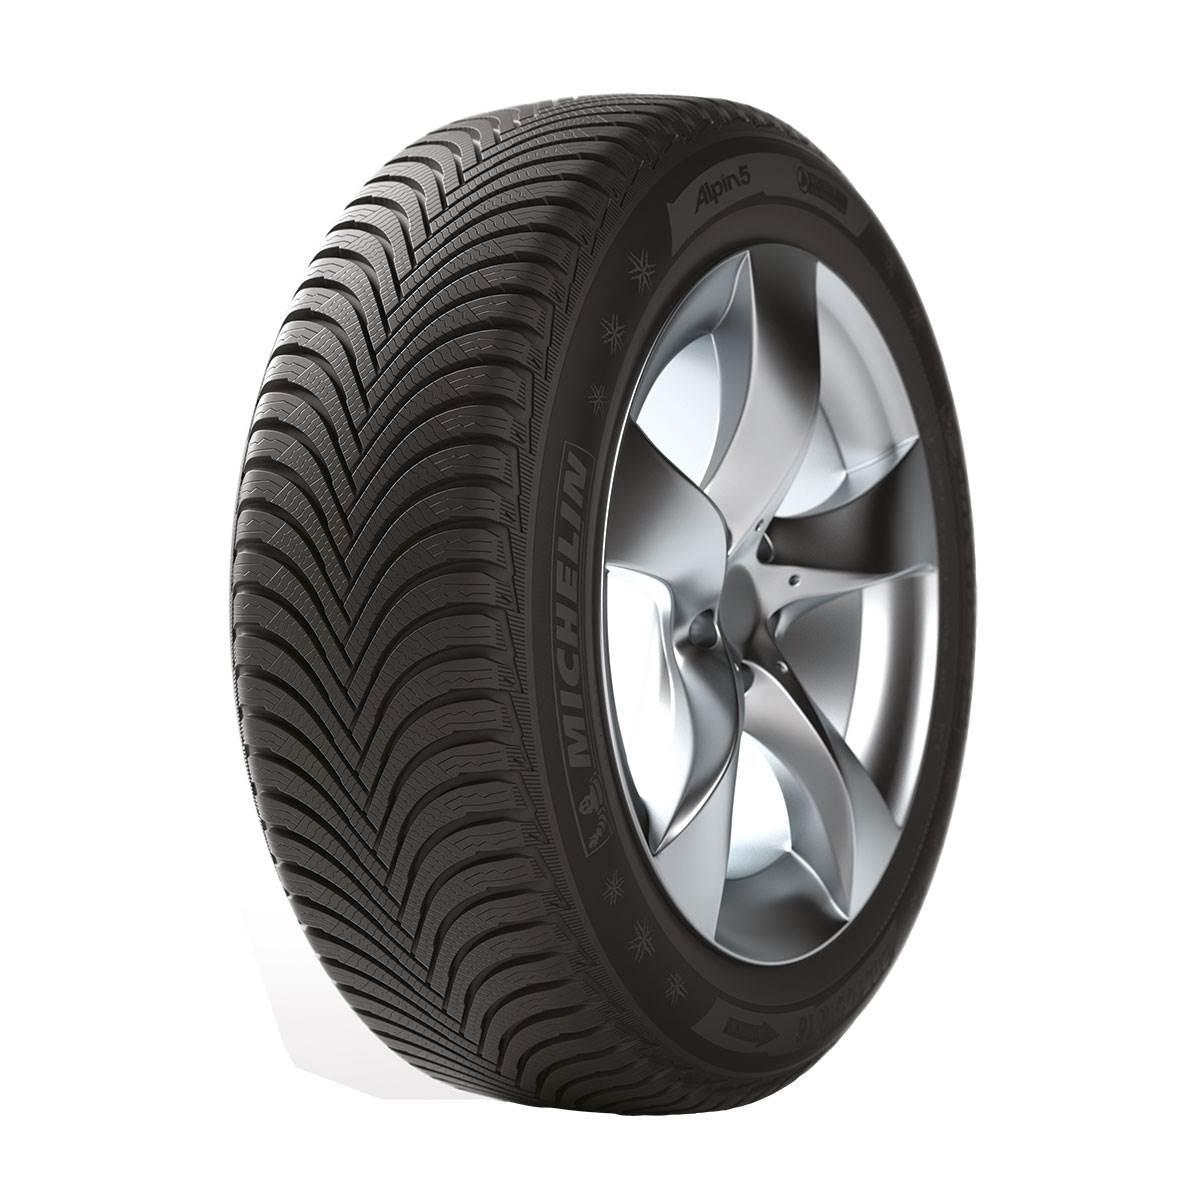 Pneu Hiver Michelin 205/55R17 95V Alpin A5 XL